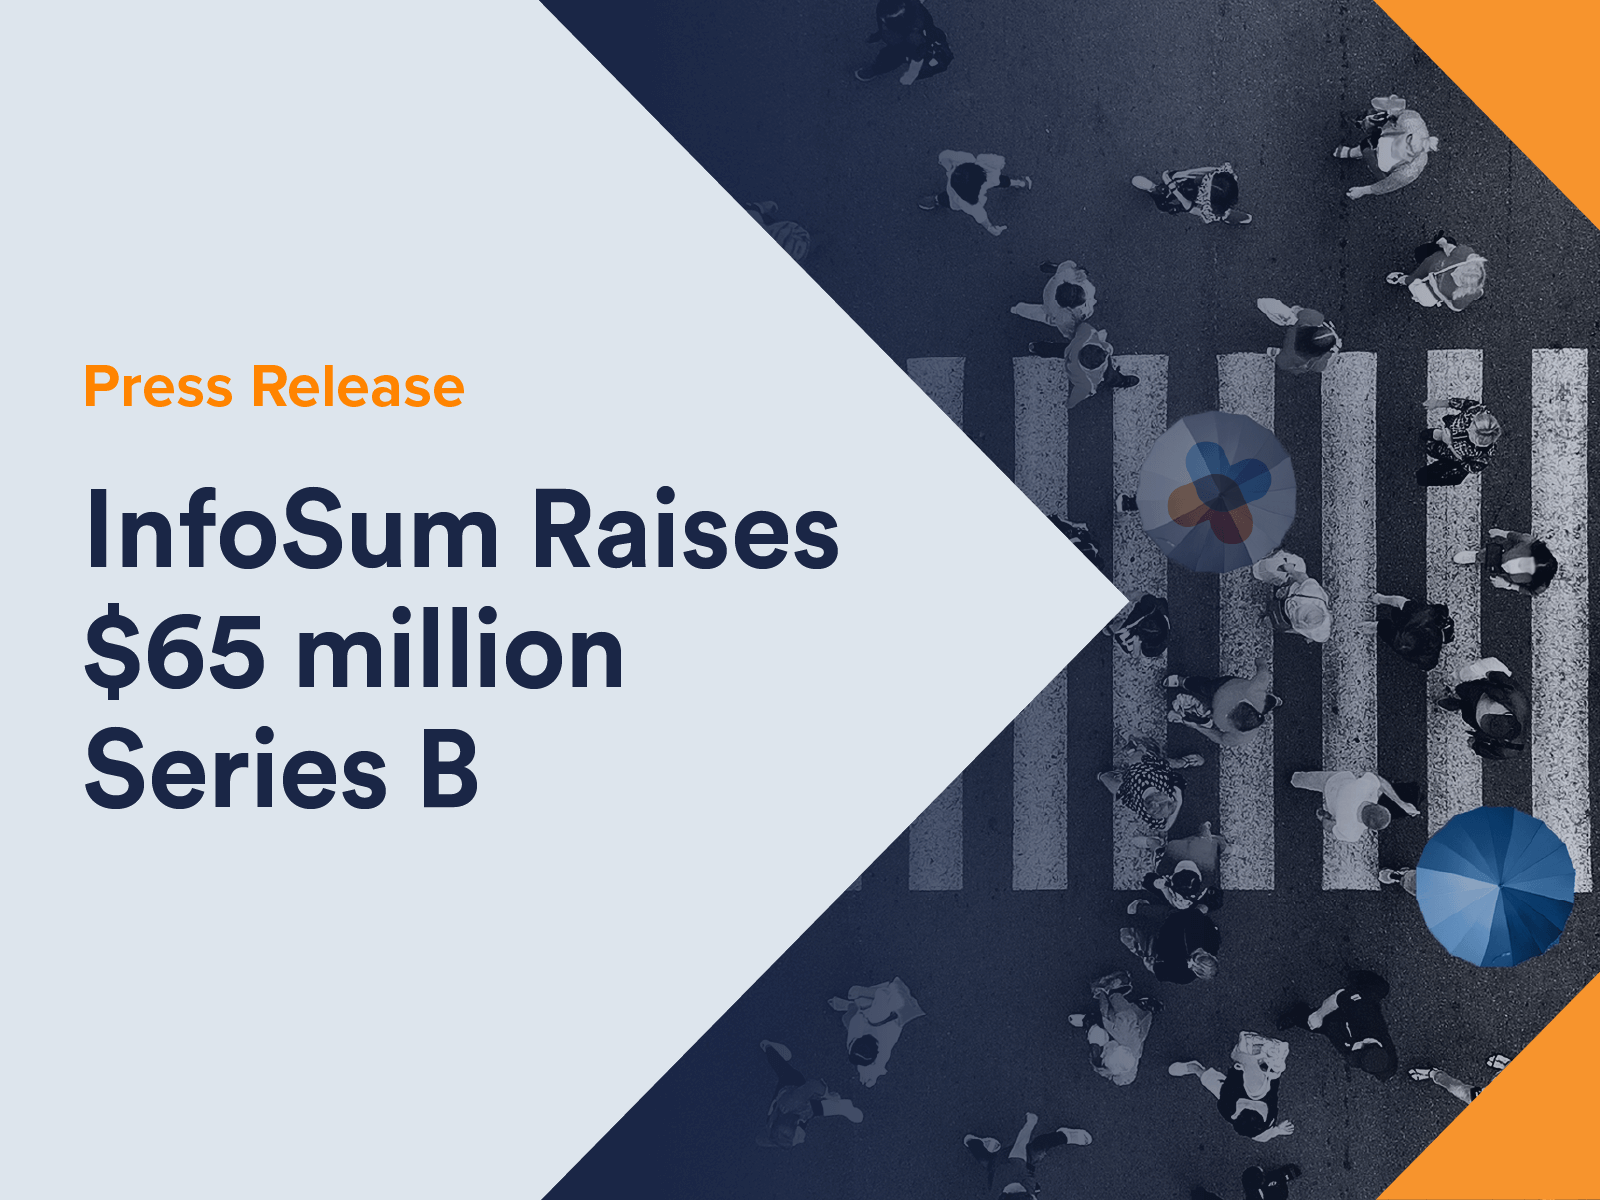 InfoSum raises $65 million Series B to build the next generation of data collaboration